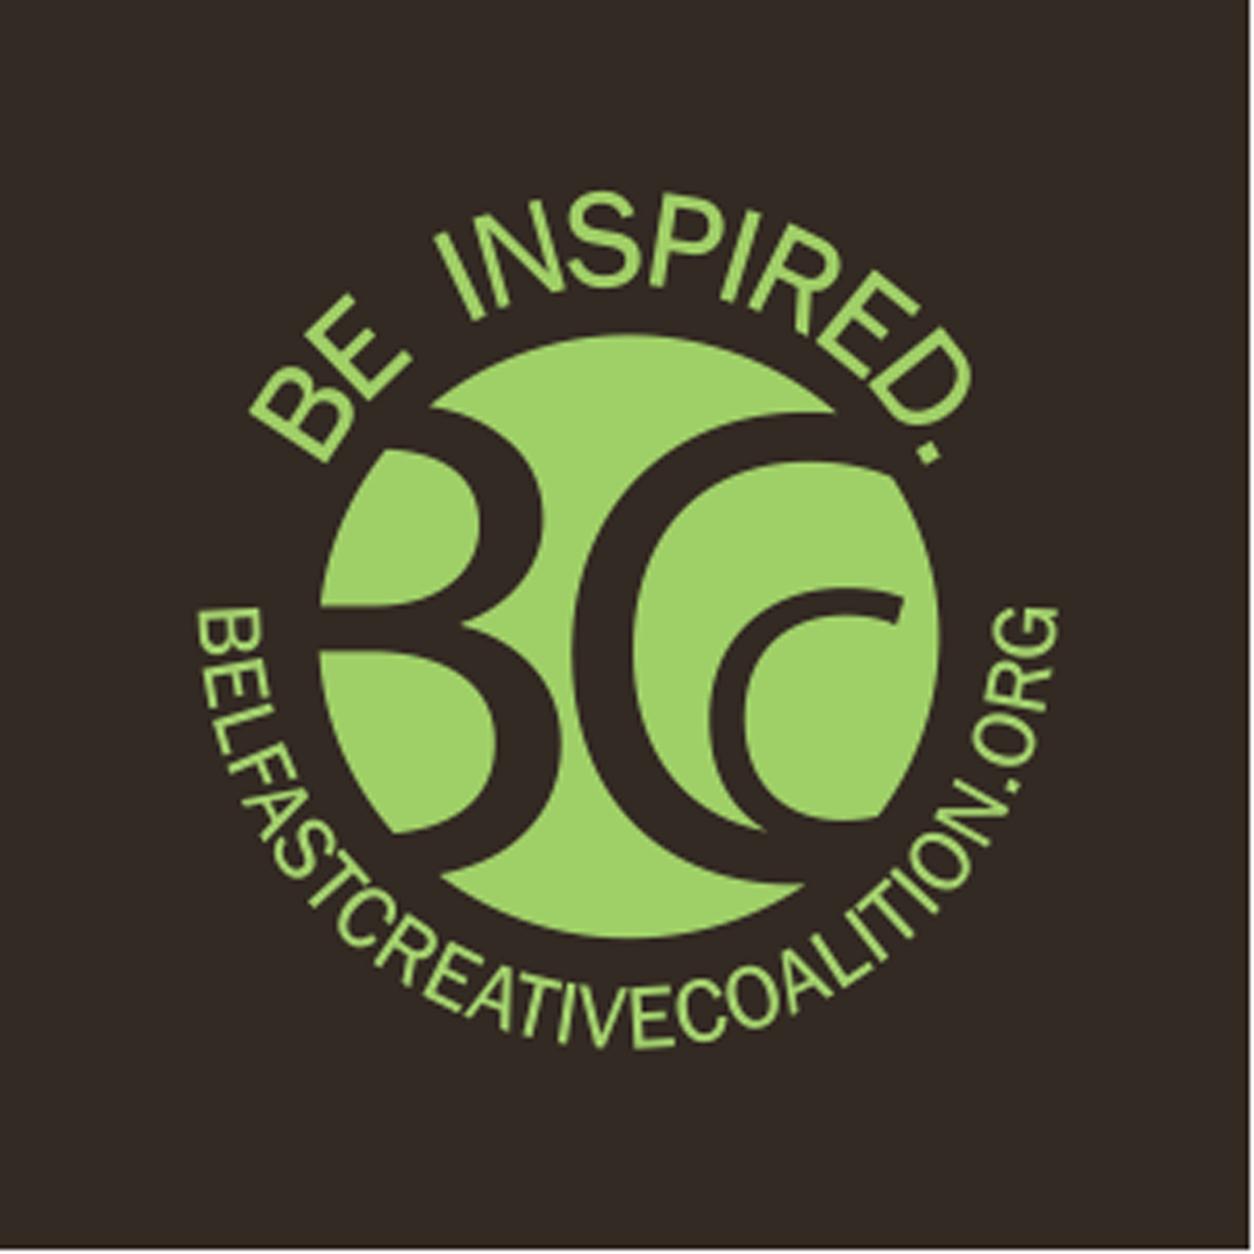 Belfast Creative Coalition